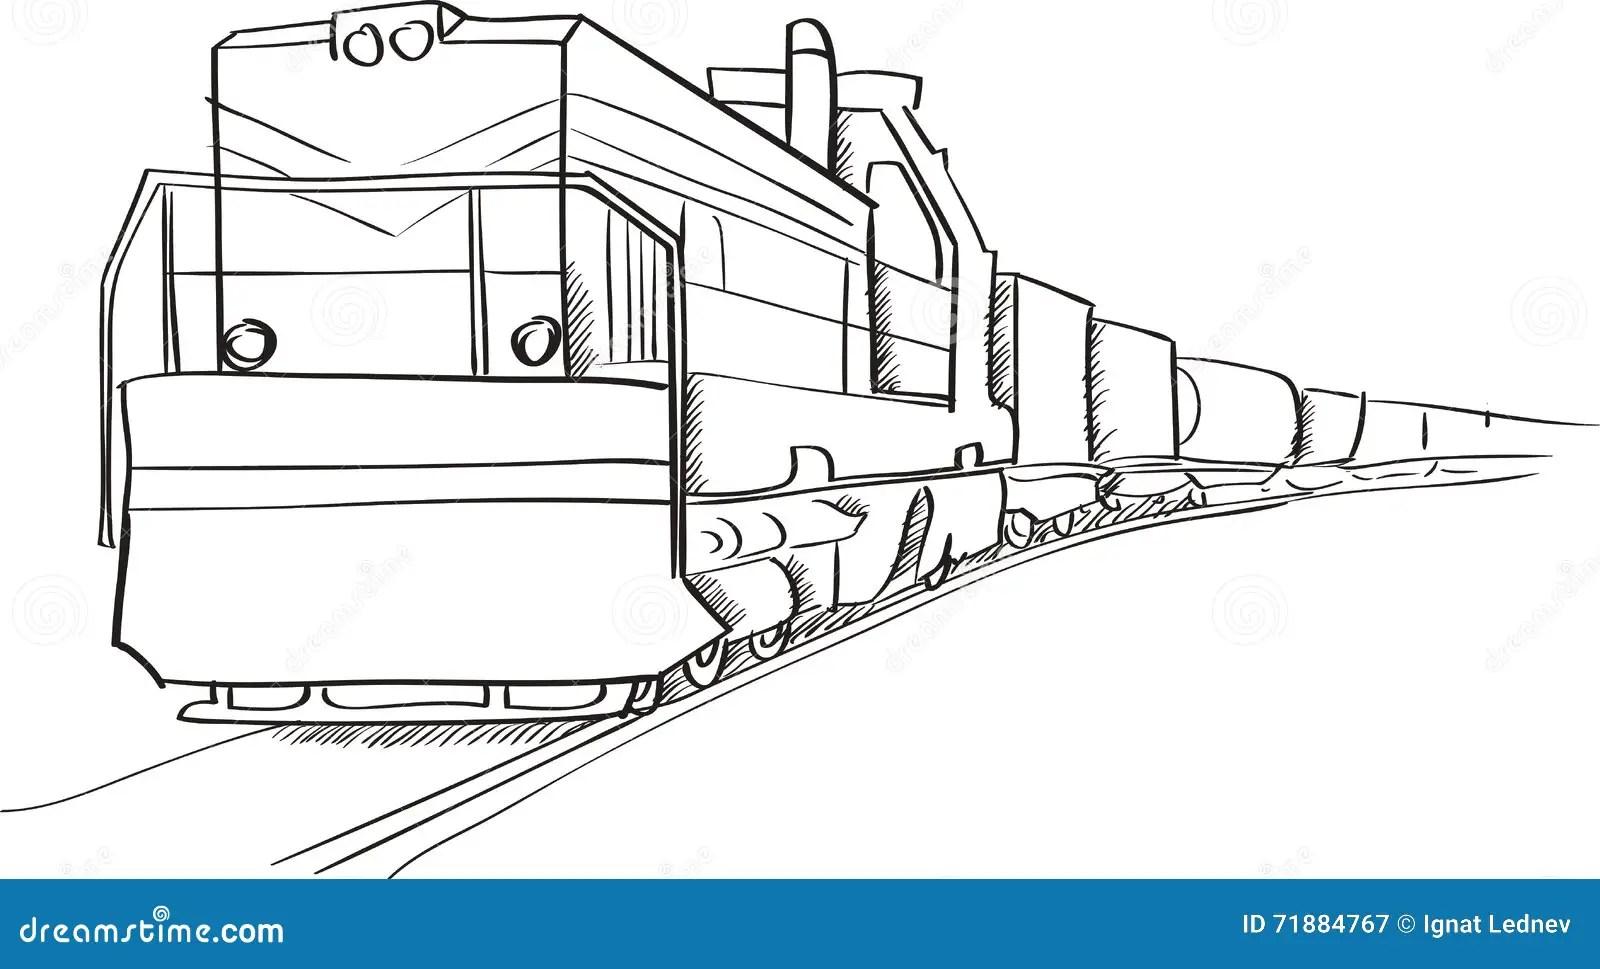 Electric Freight Locomotive Model